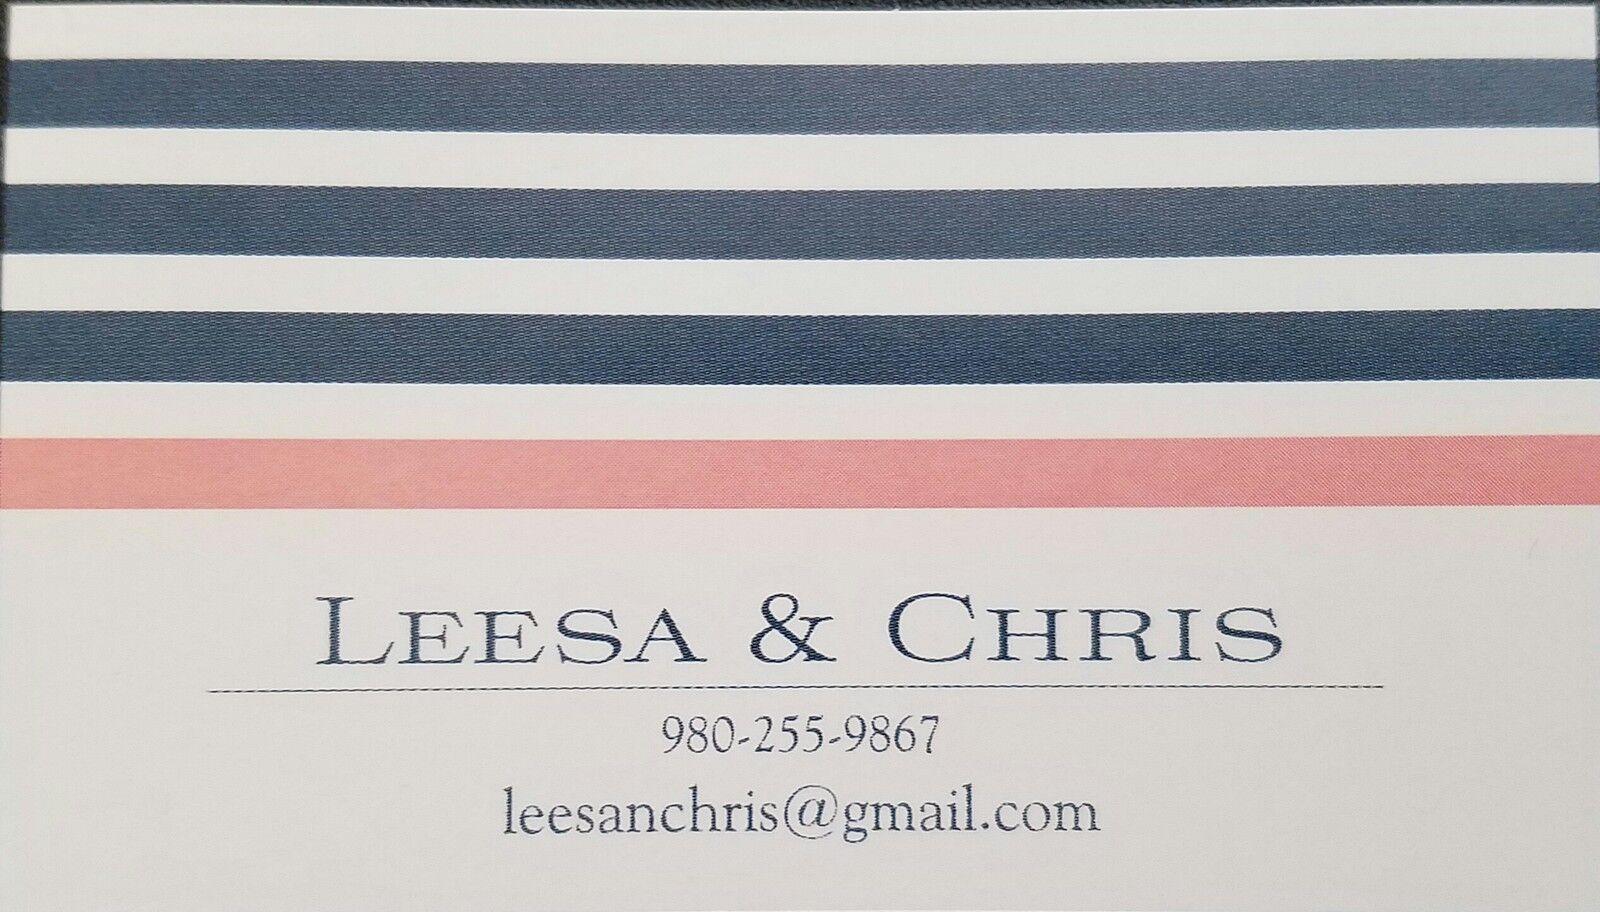 leesa&chris